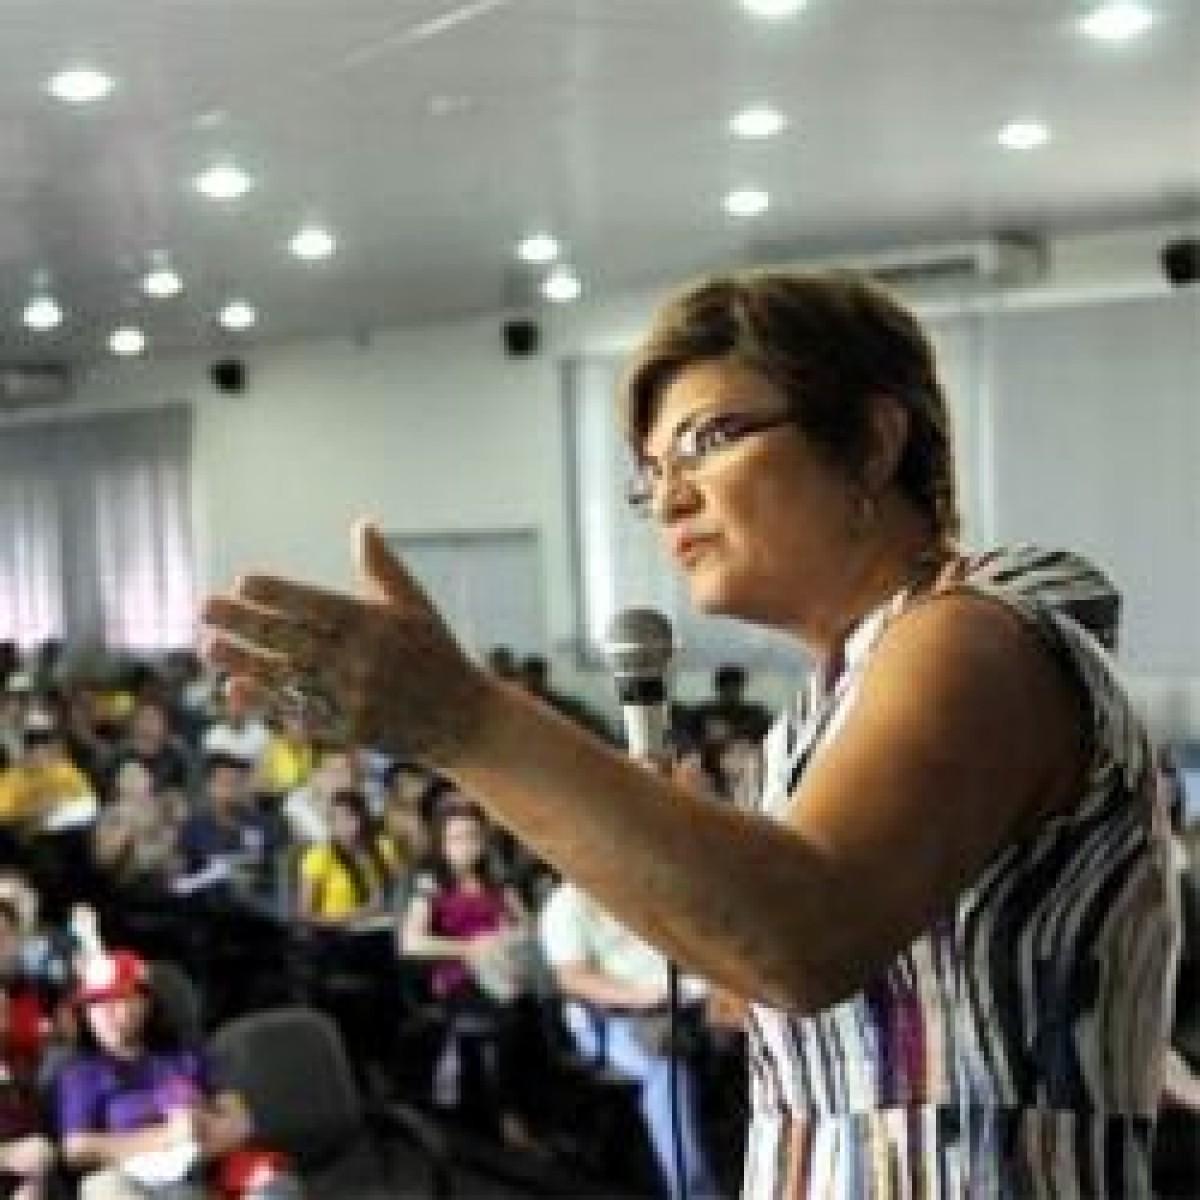 """Agrotóxico vai contaminar a água"", afirma pesquisadora Raquel Rigotto"